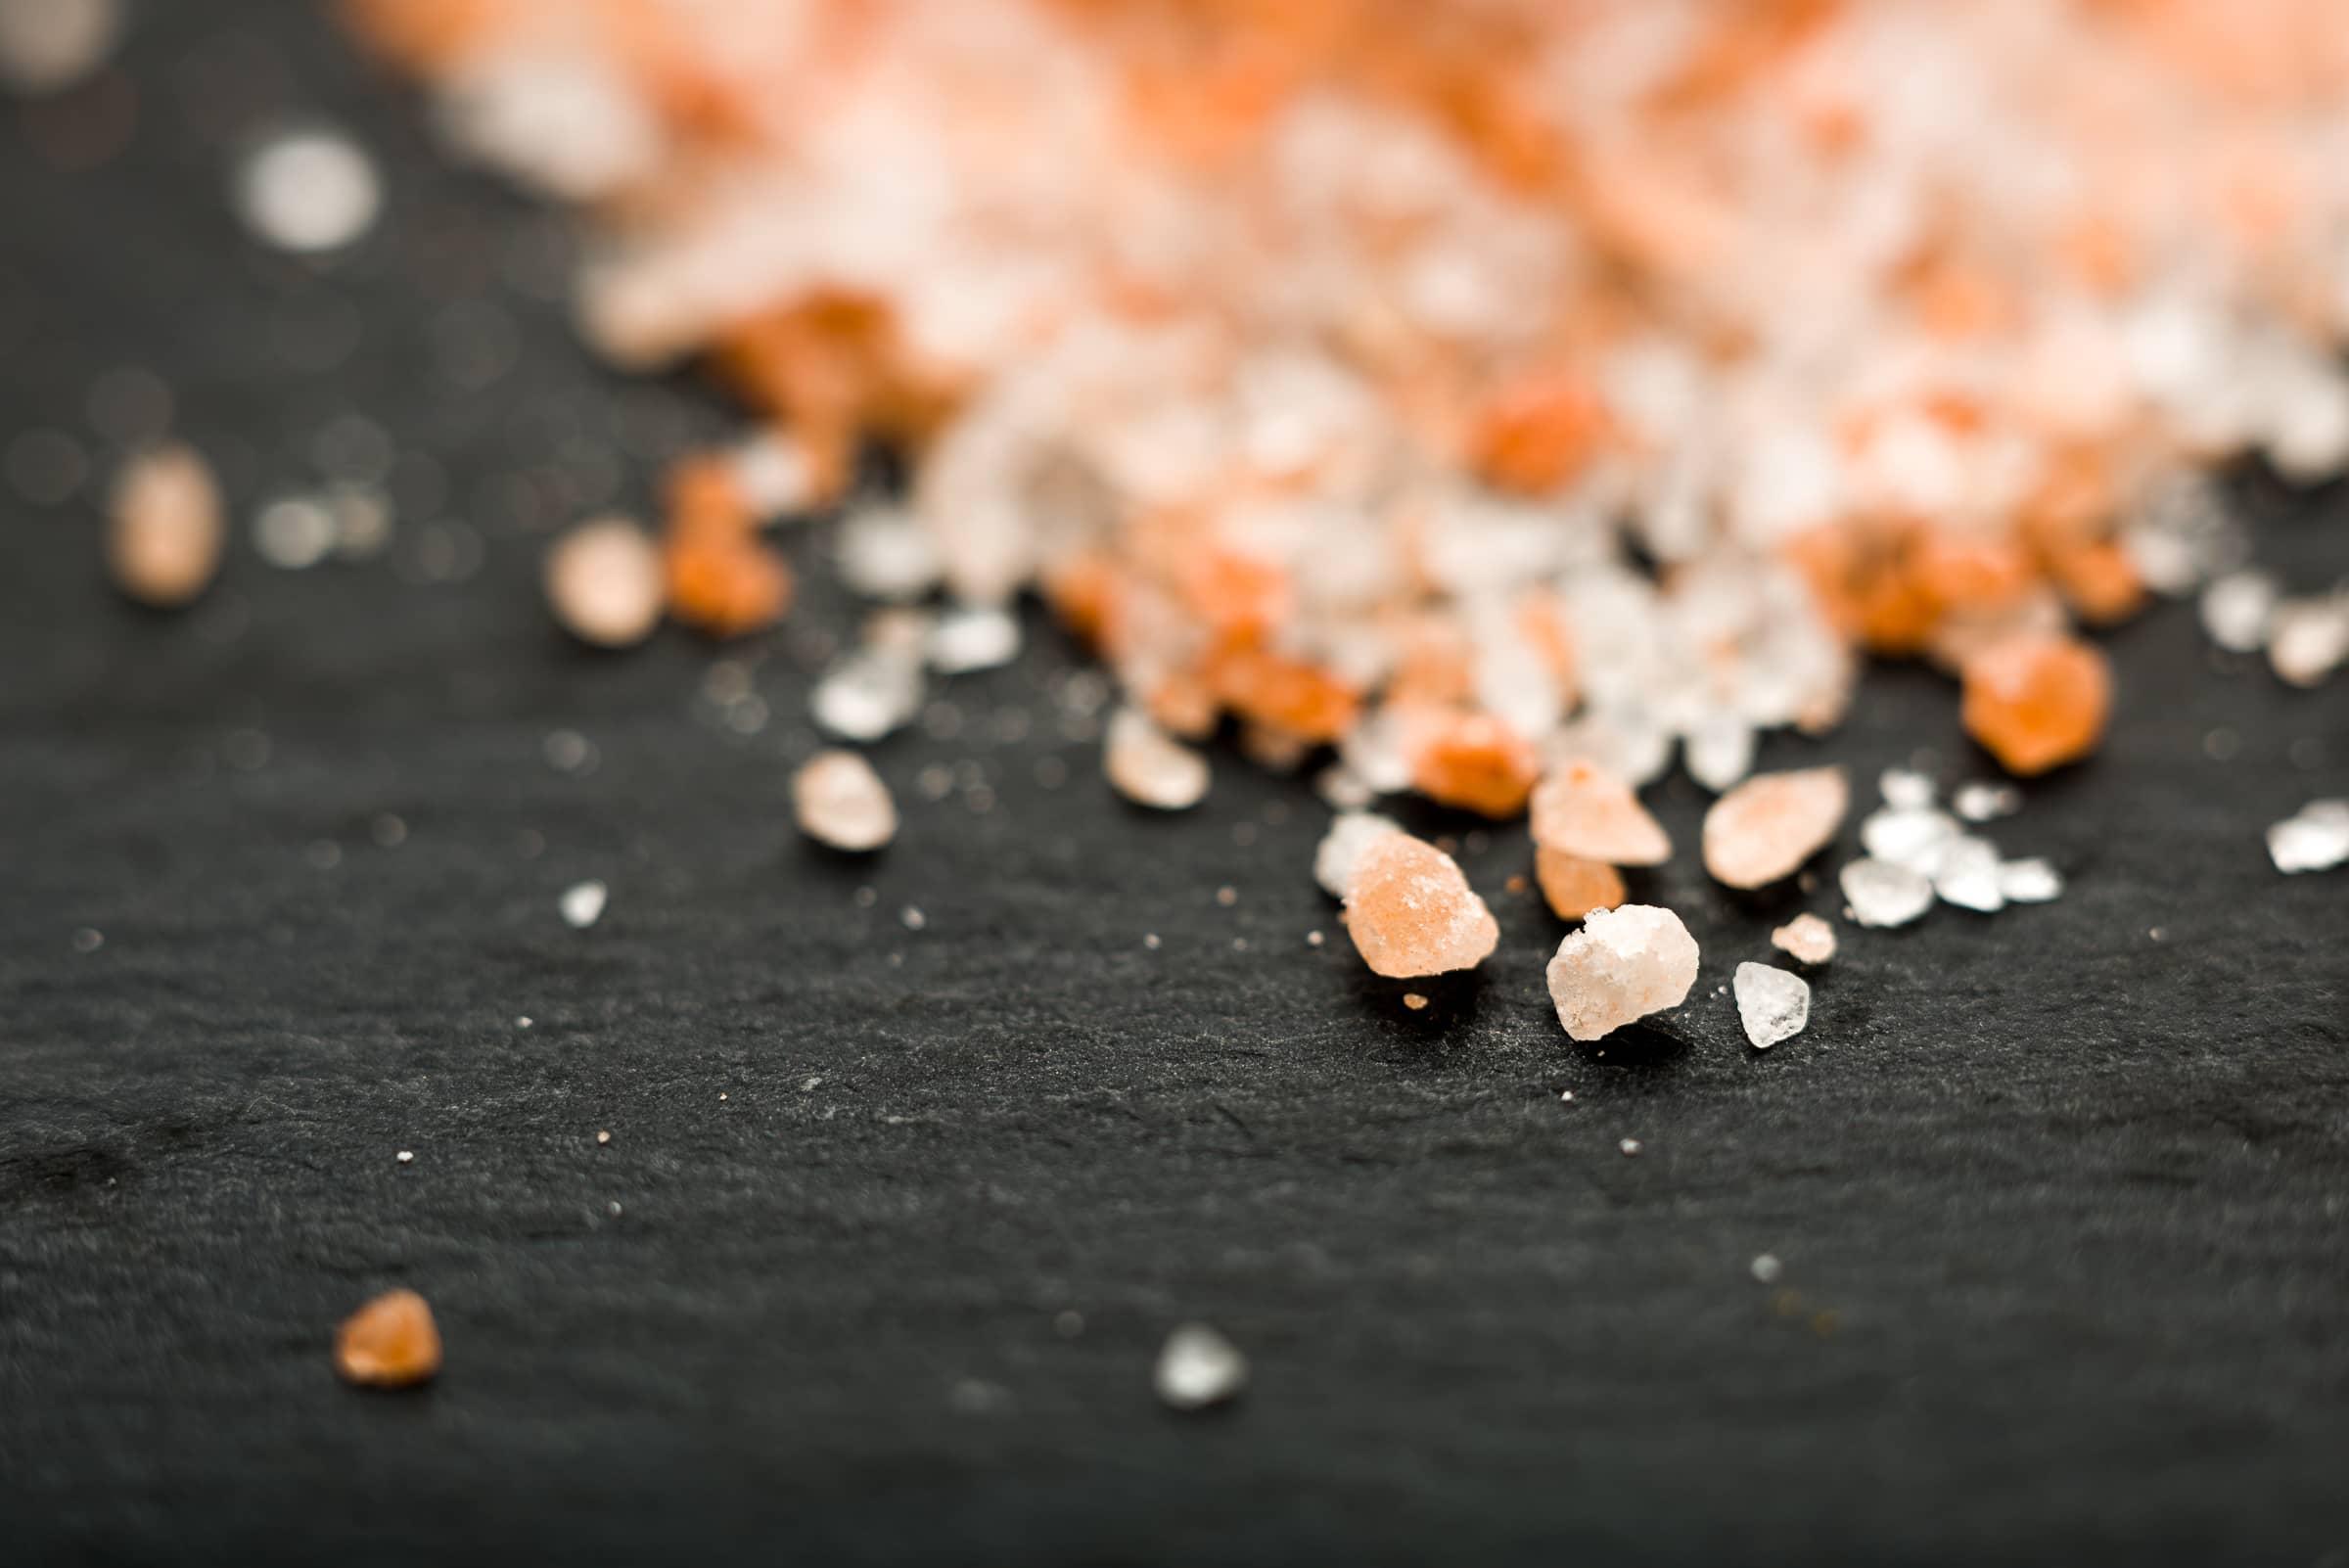 Fotografia macro di cibi - Sale rosa ingrediente 135mm + 27mm GnamAm.com